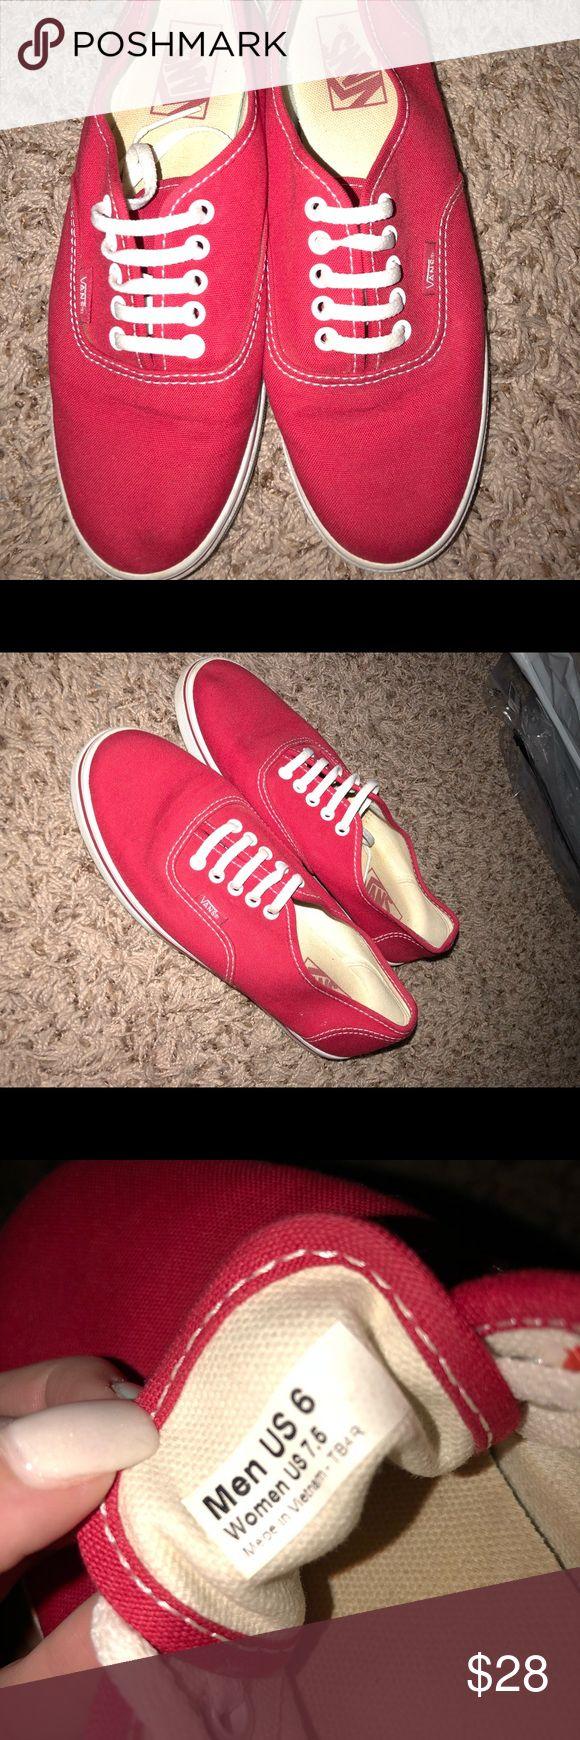 Vans authentic red Men's size 6 women's size 7.5 worn once Vans Shoes Sneakers